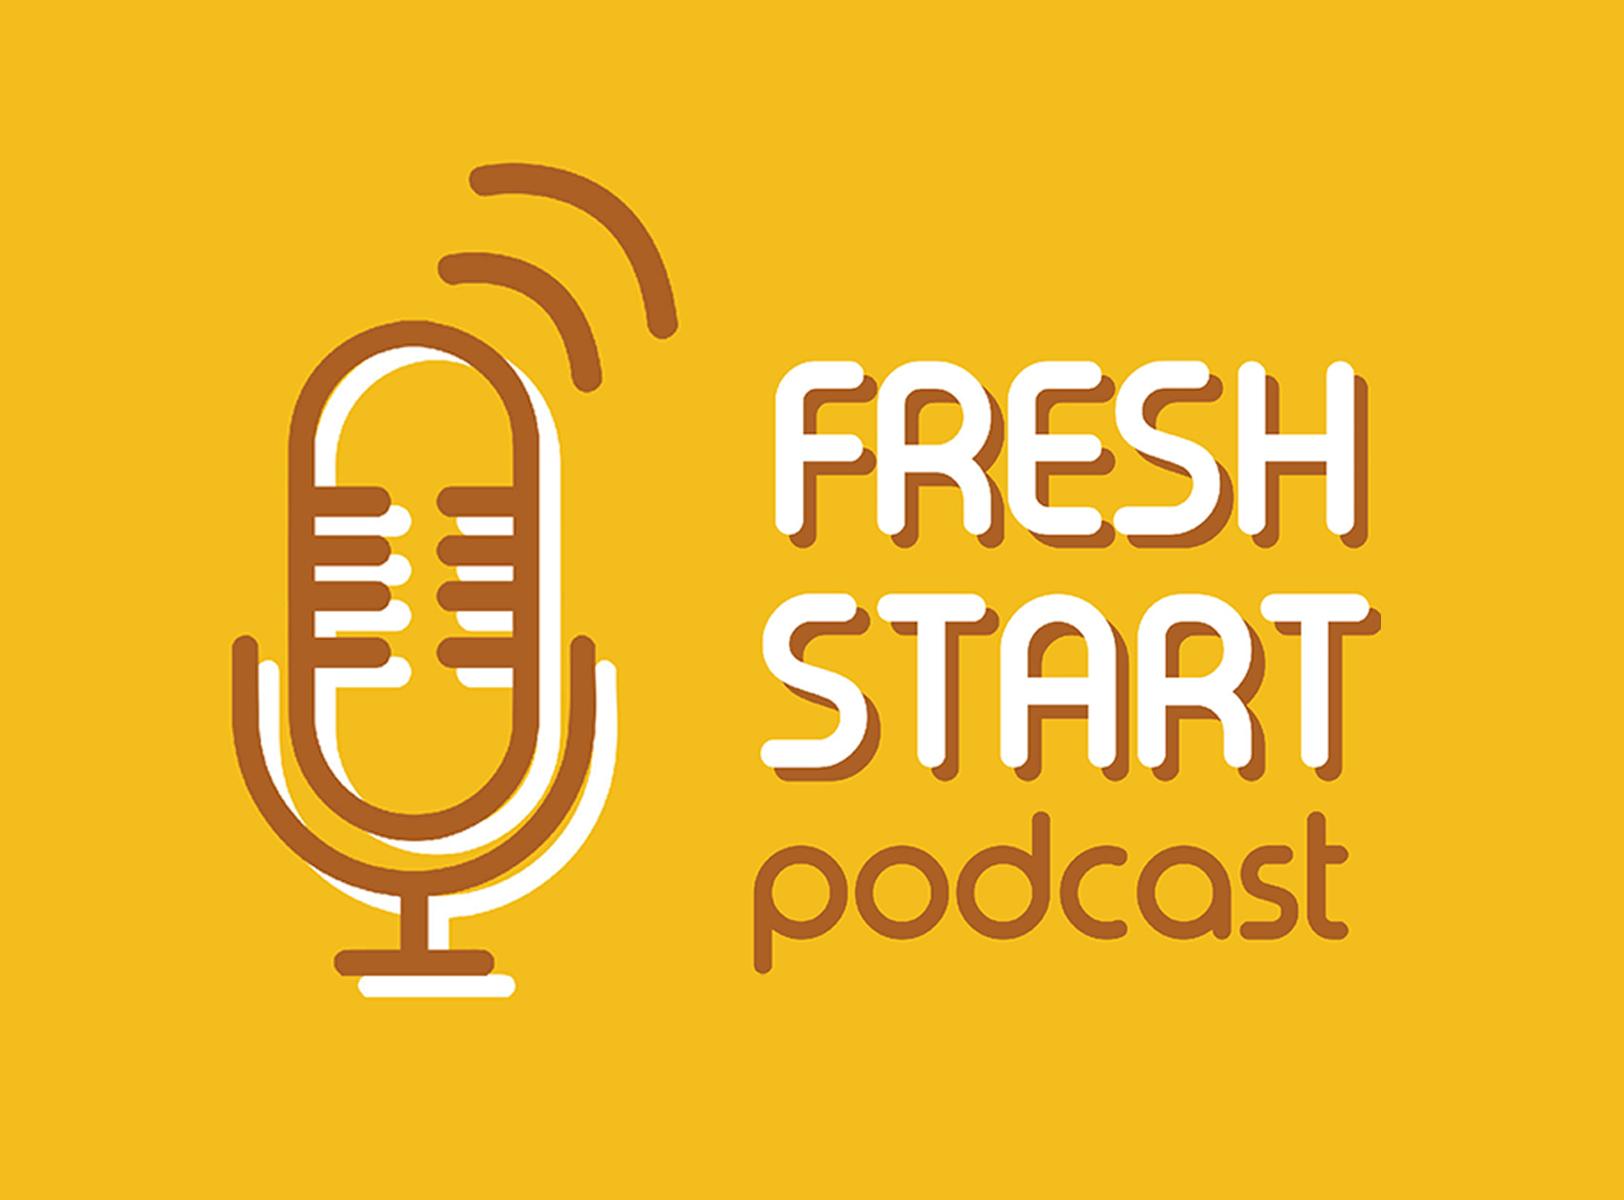 Fresh Start: Podcast News (12/6/2019 Fri.)